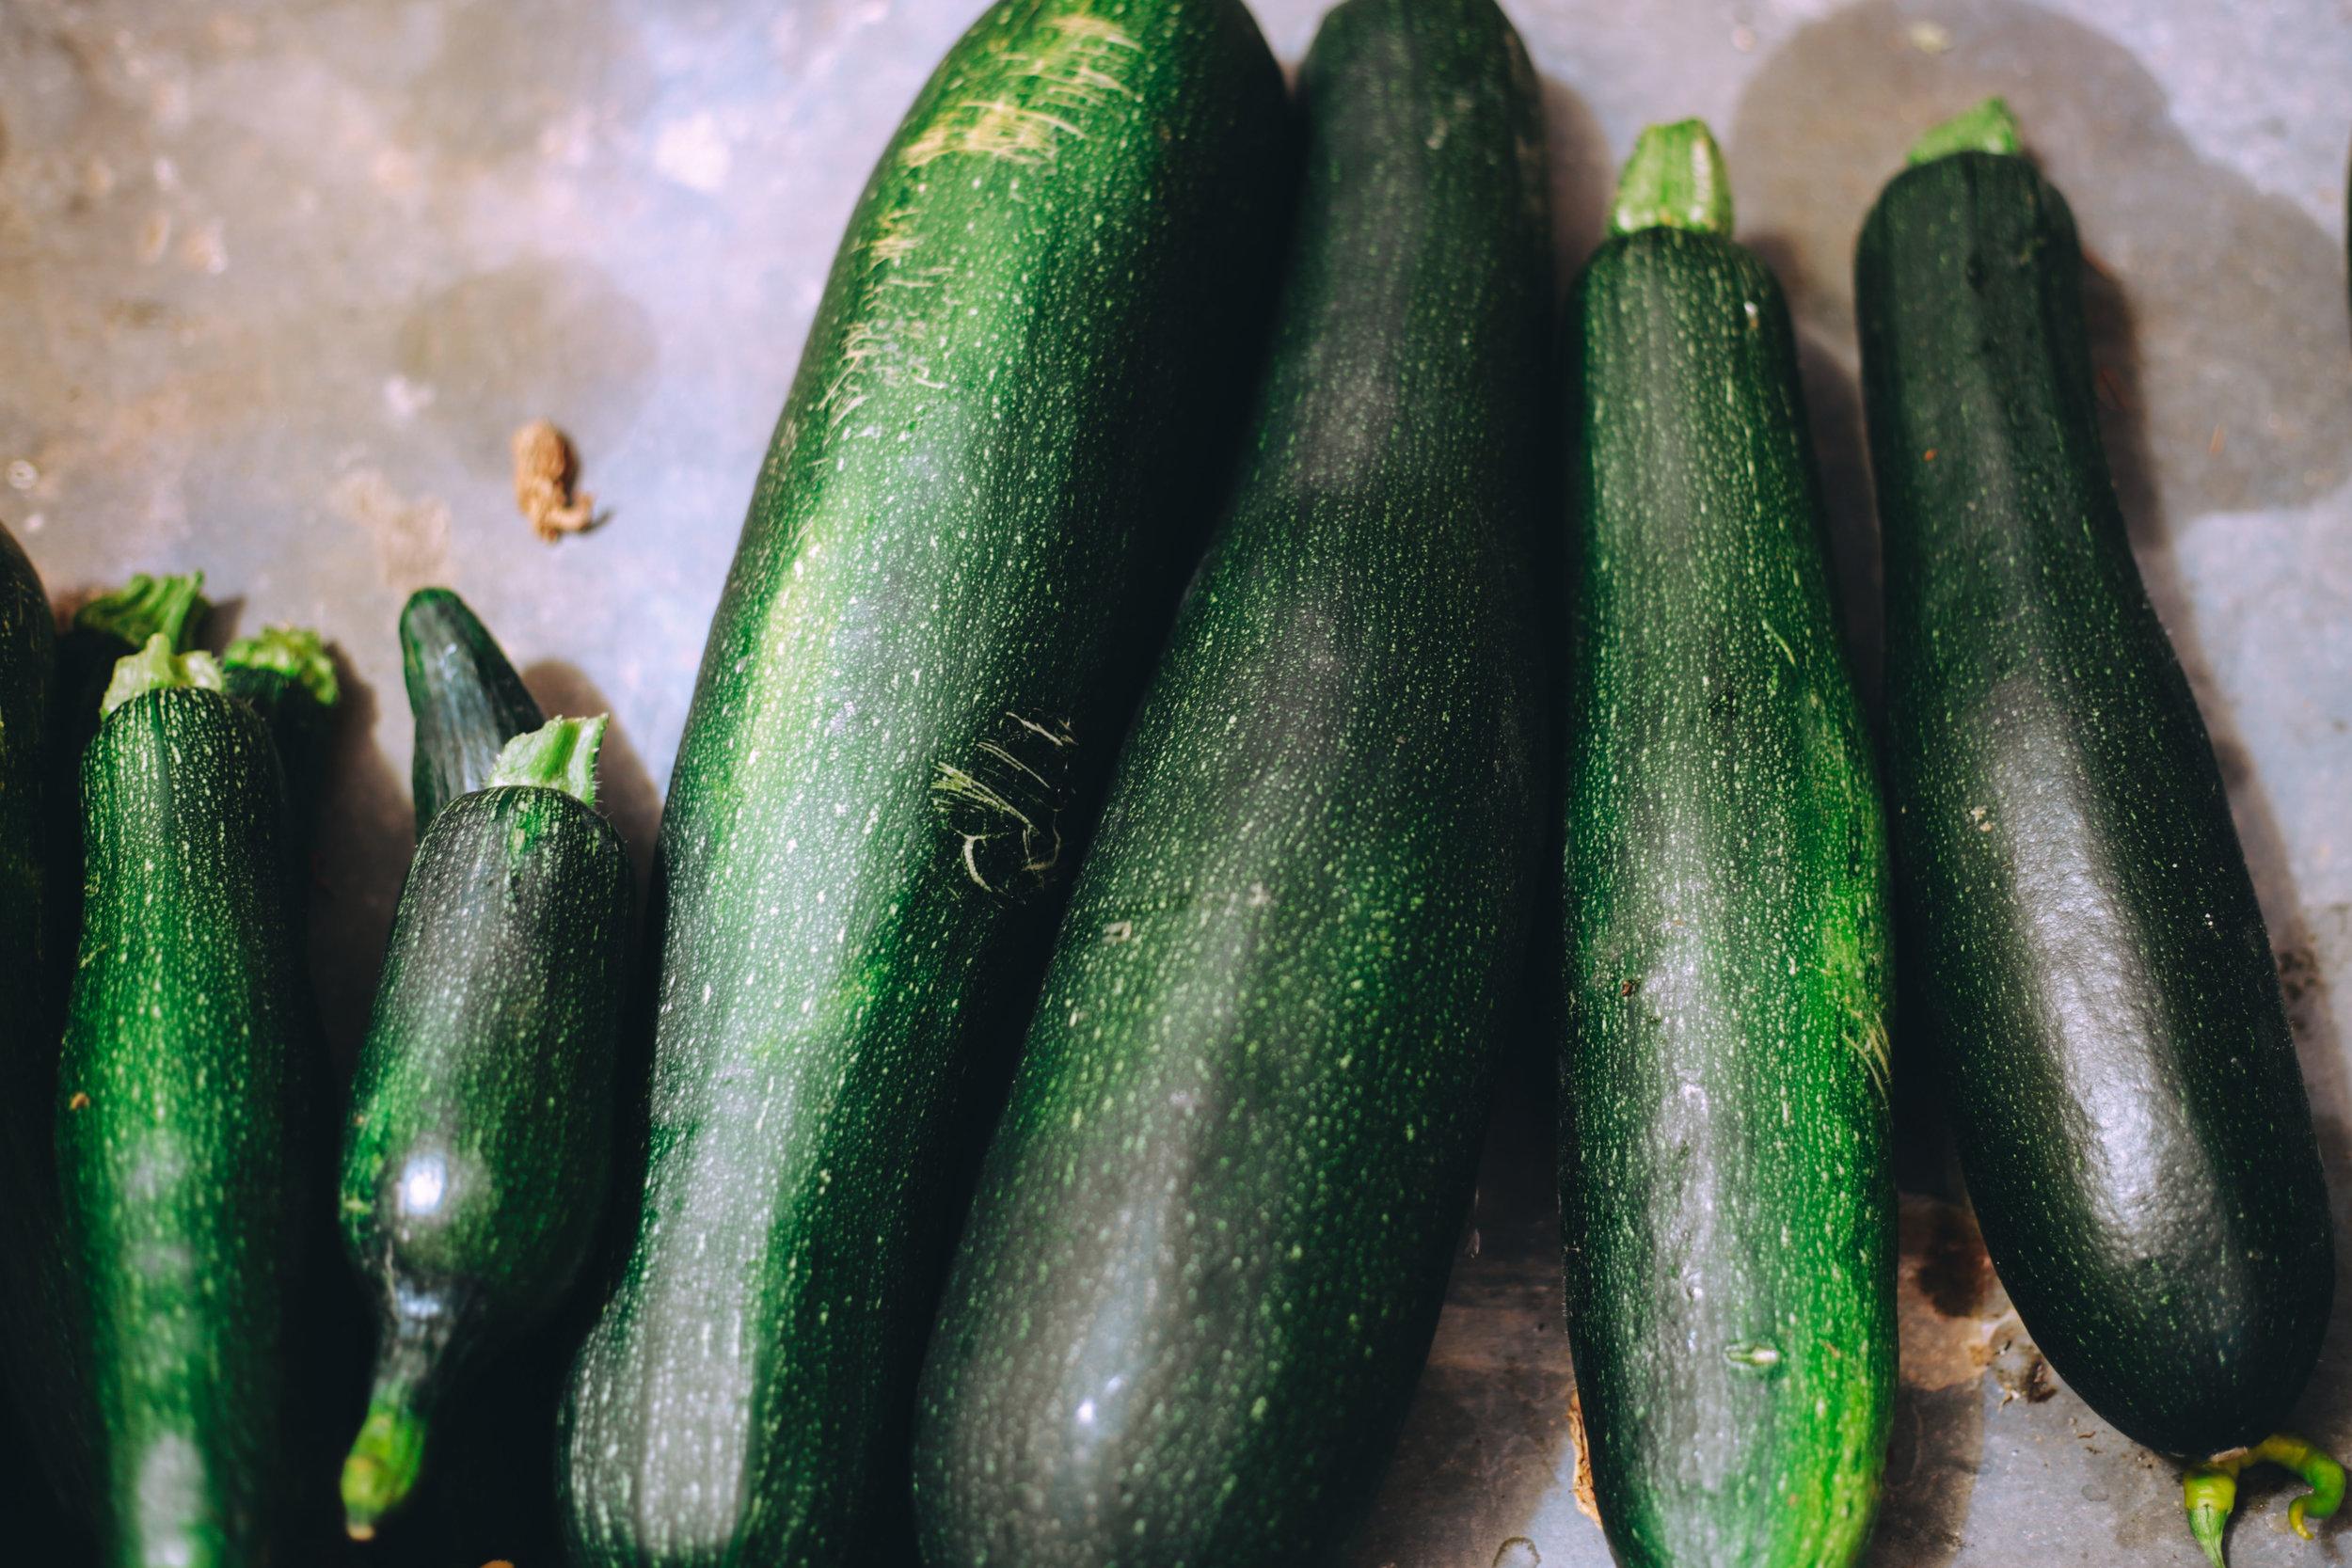 Zucchini - rich in iron, antioxidants and vitamin c.